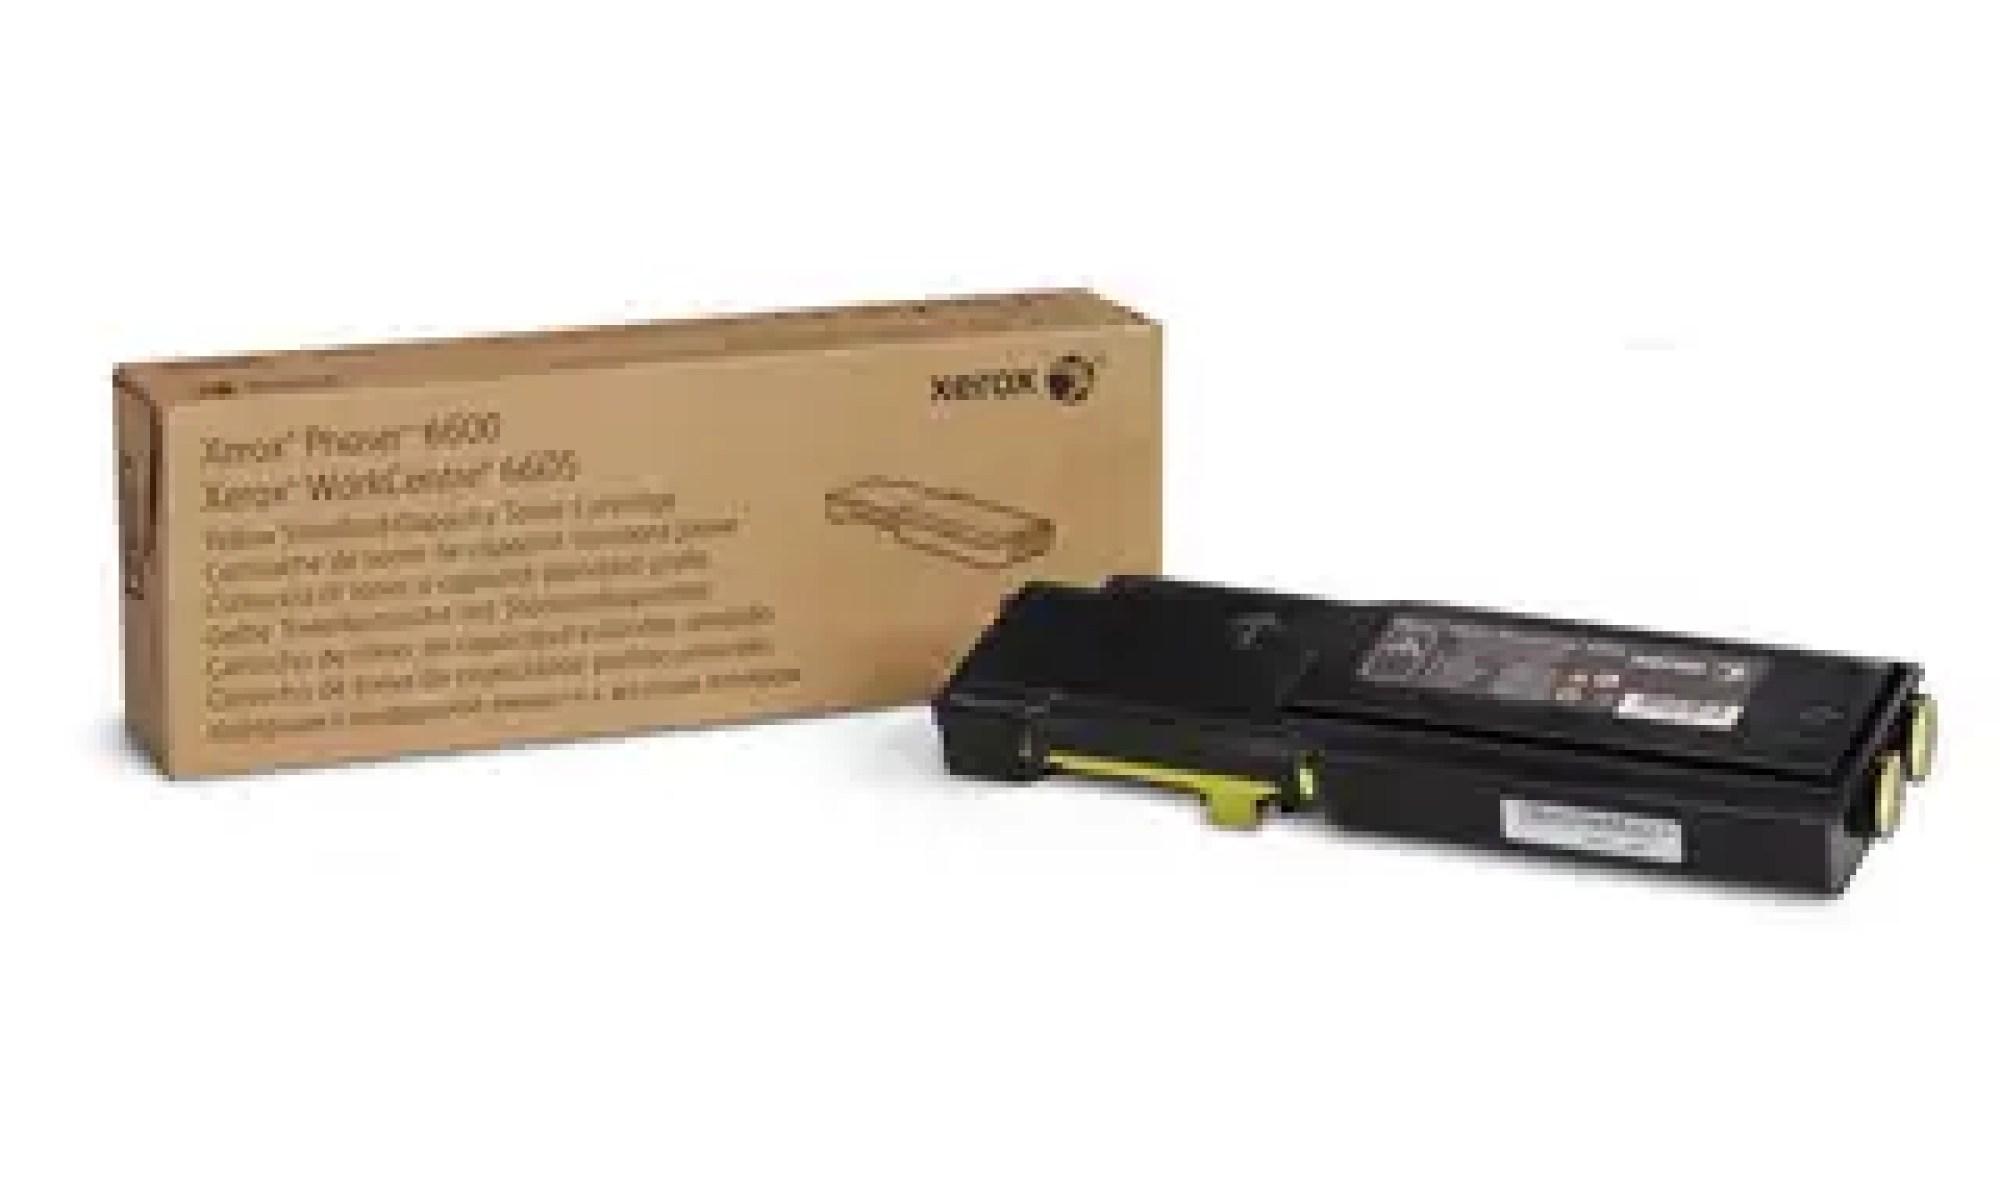 106R02251 Toner capacitate mica yellow pentru Phaser 6600, WorkCentre 6605